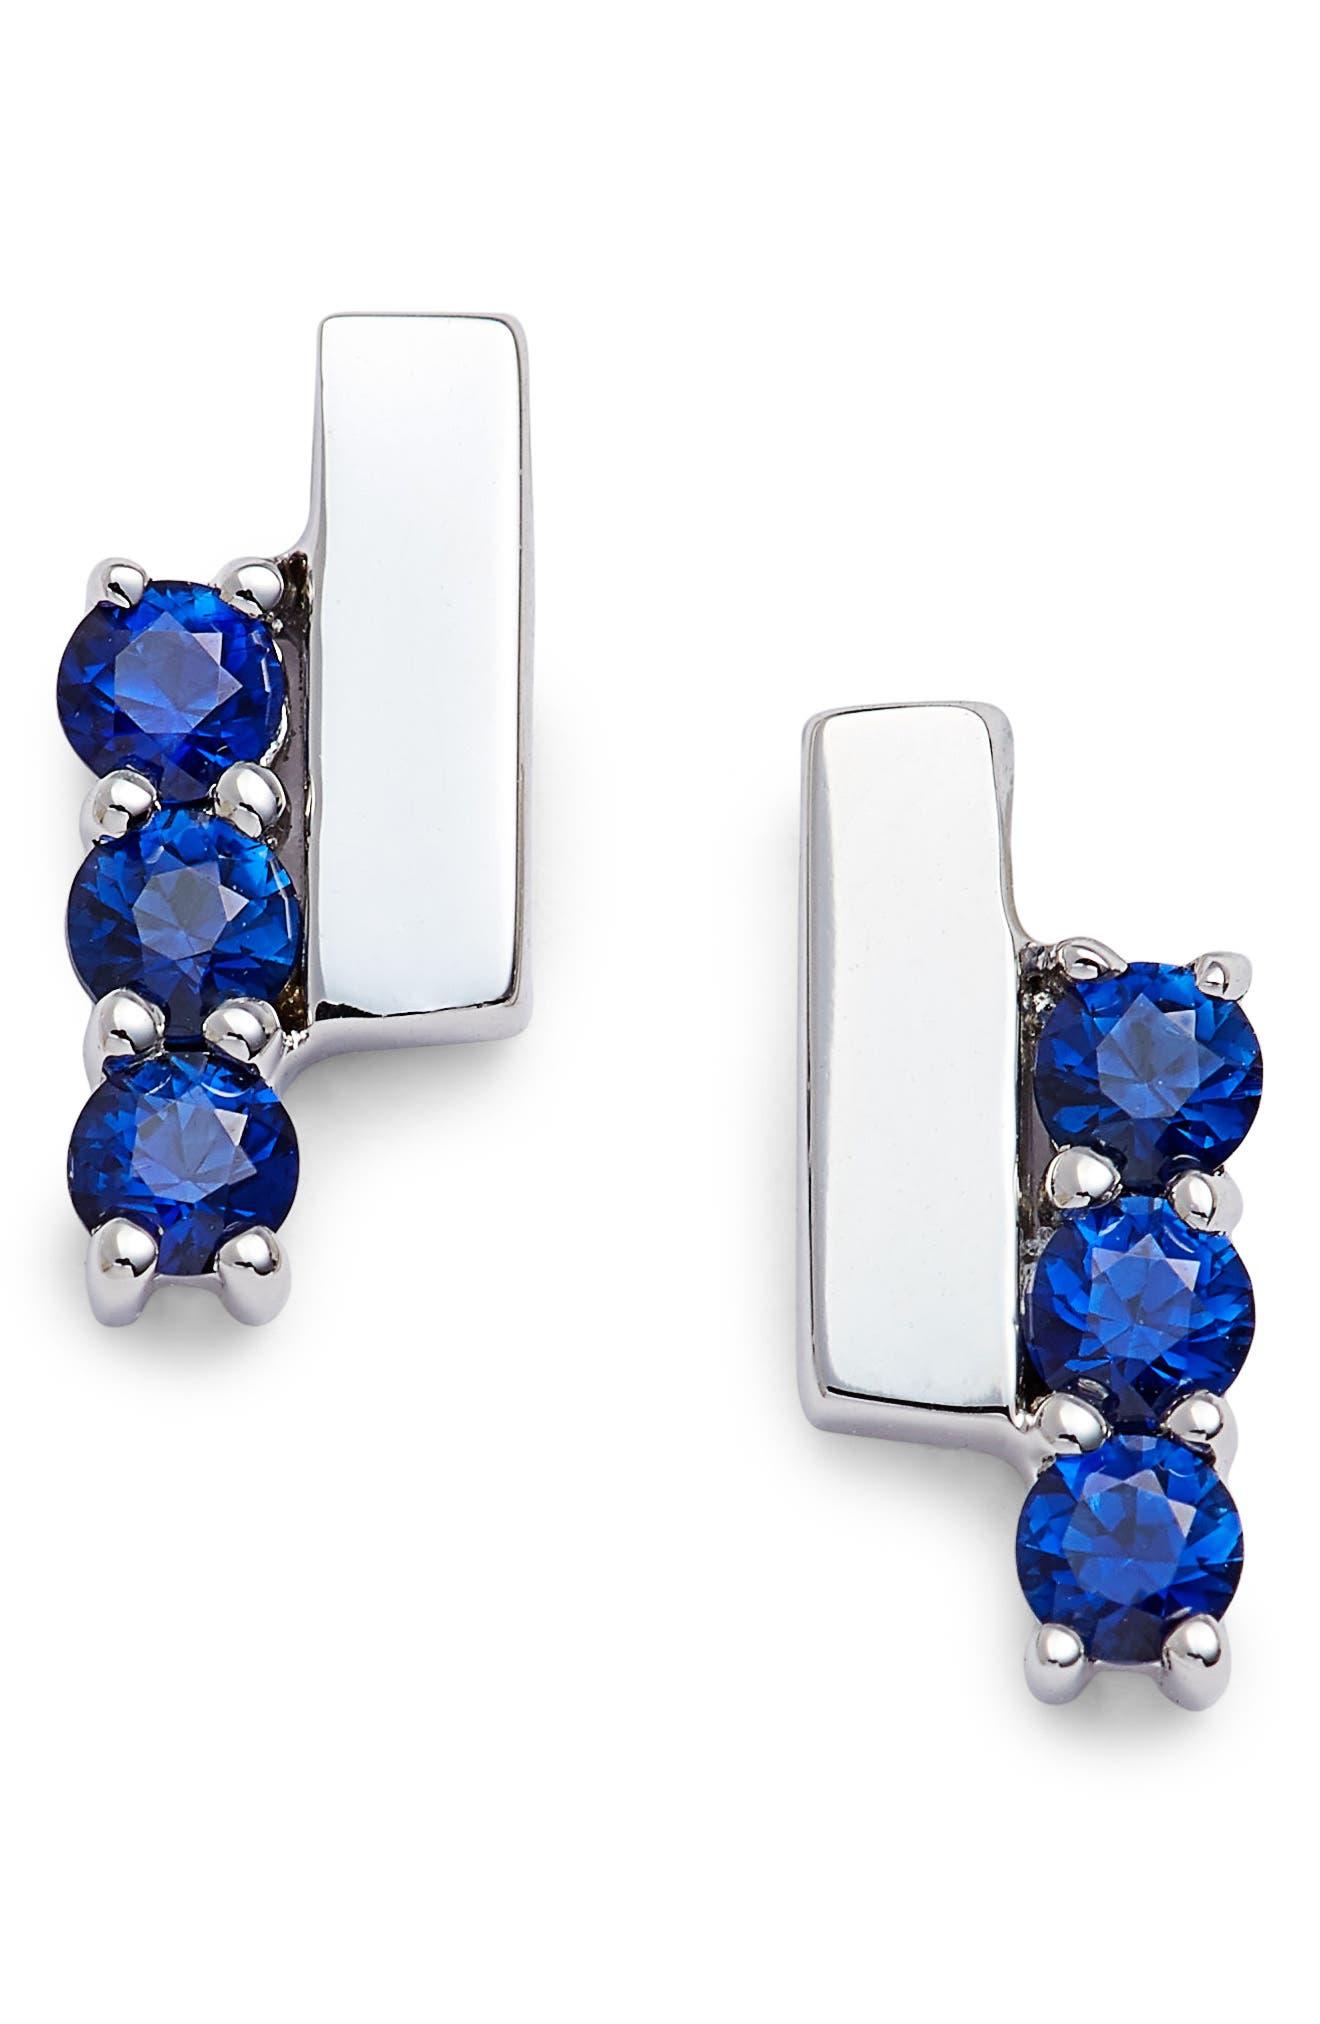 Sylvie Rose Sapphire Bar Stud Earrings,                             Main thumbnail 1, color,                             WHITE GOLD/ BLUE SAPPHIRE